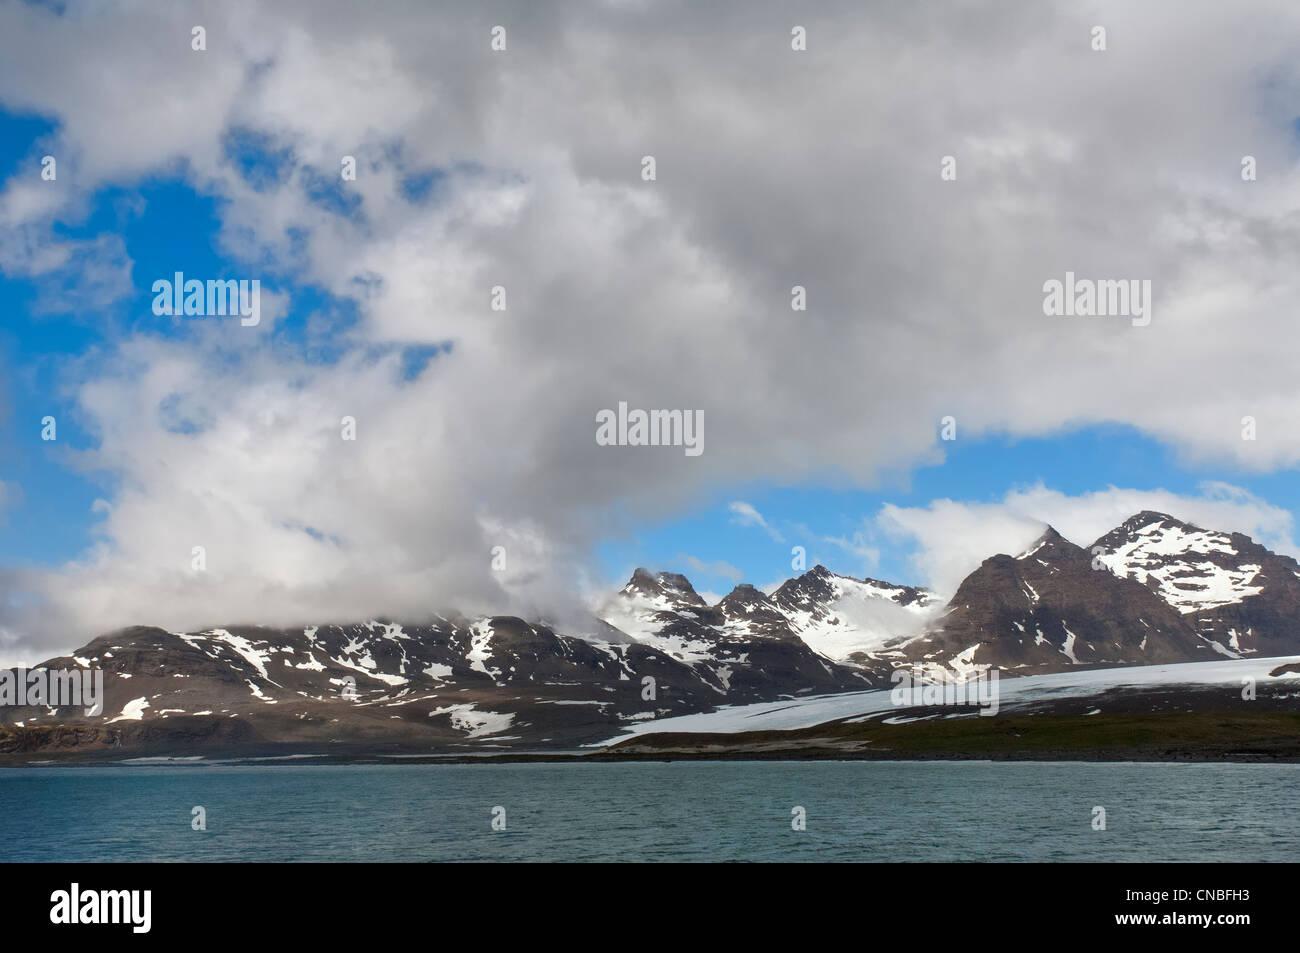 South Georgia West Coast, Sub Antarctic Region - Stock Image